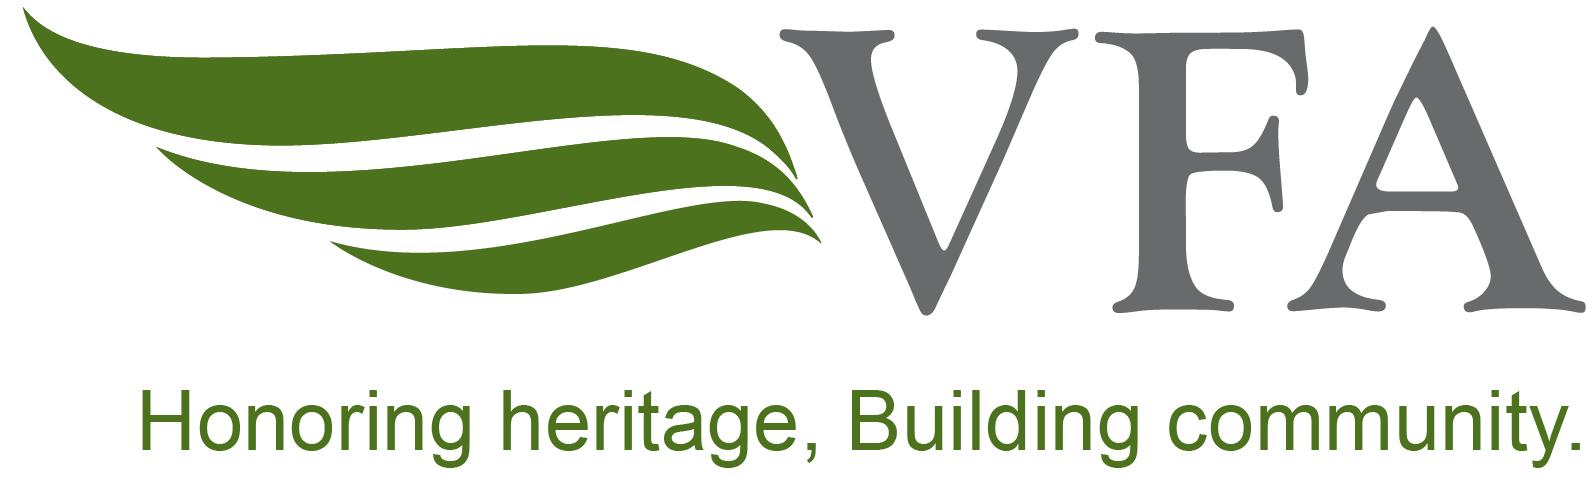 vfa-logo.png